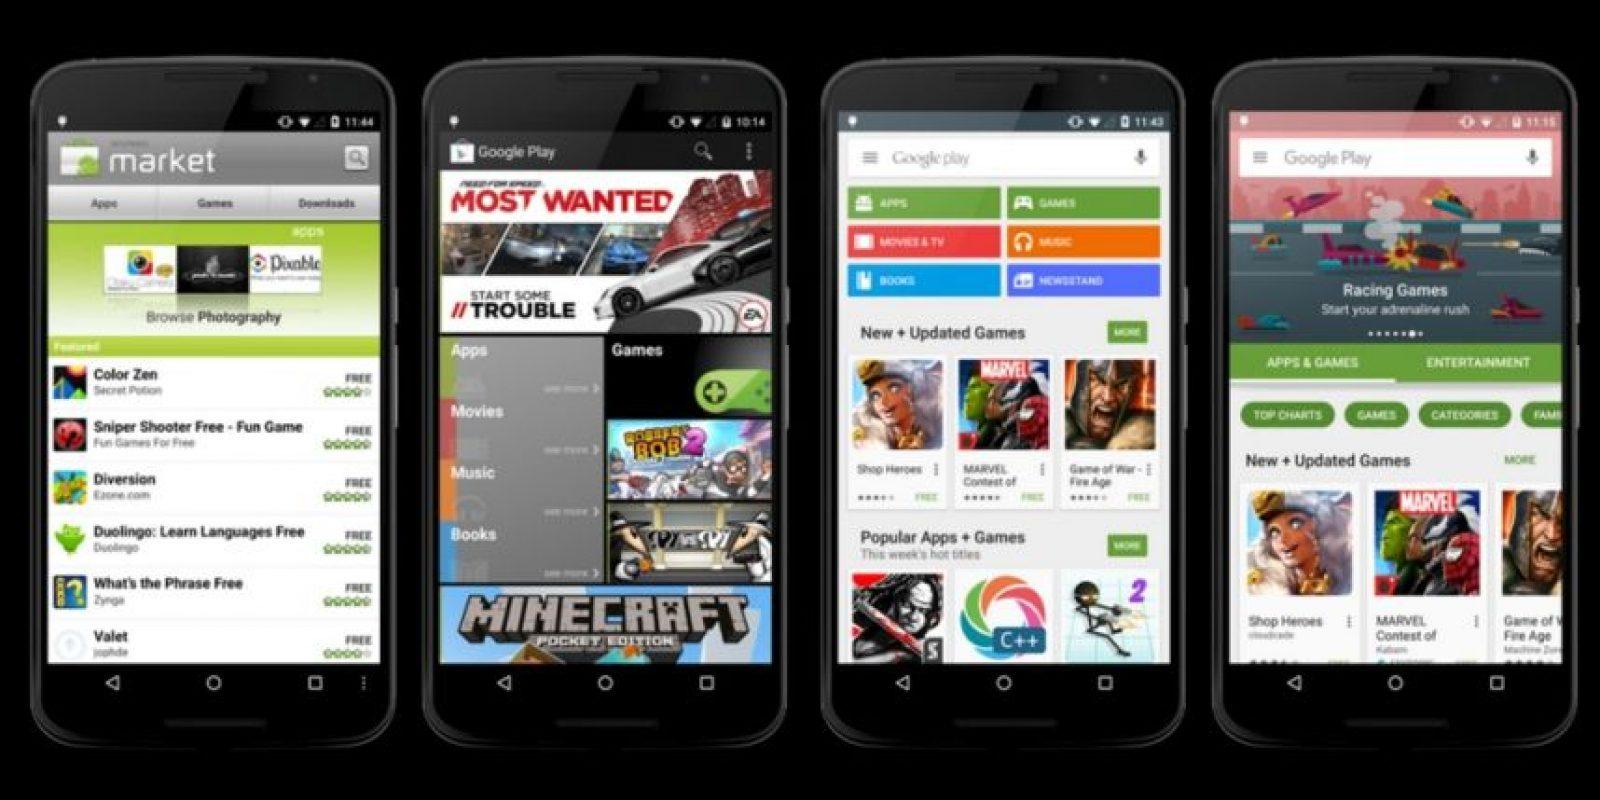 Así ha evolucionado la tienda de apps para Android. Foto:vía plus.google.com/+KirillGrouchnikov